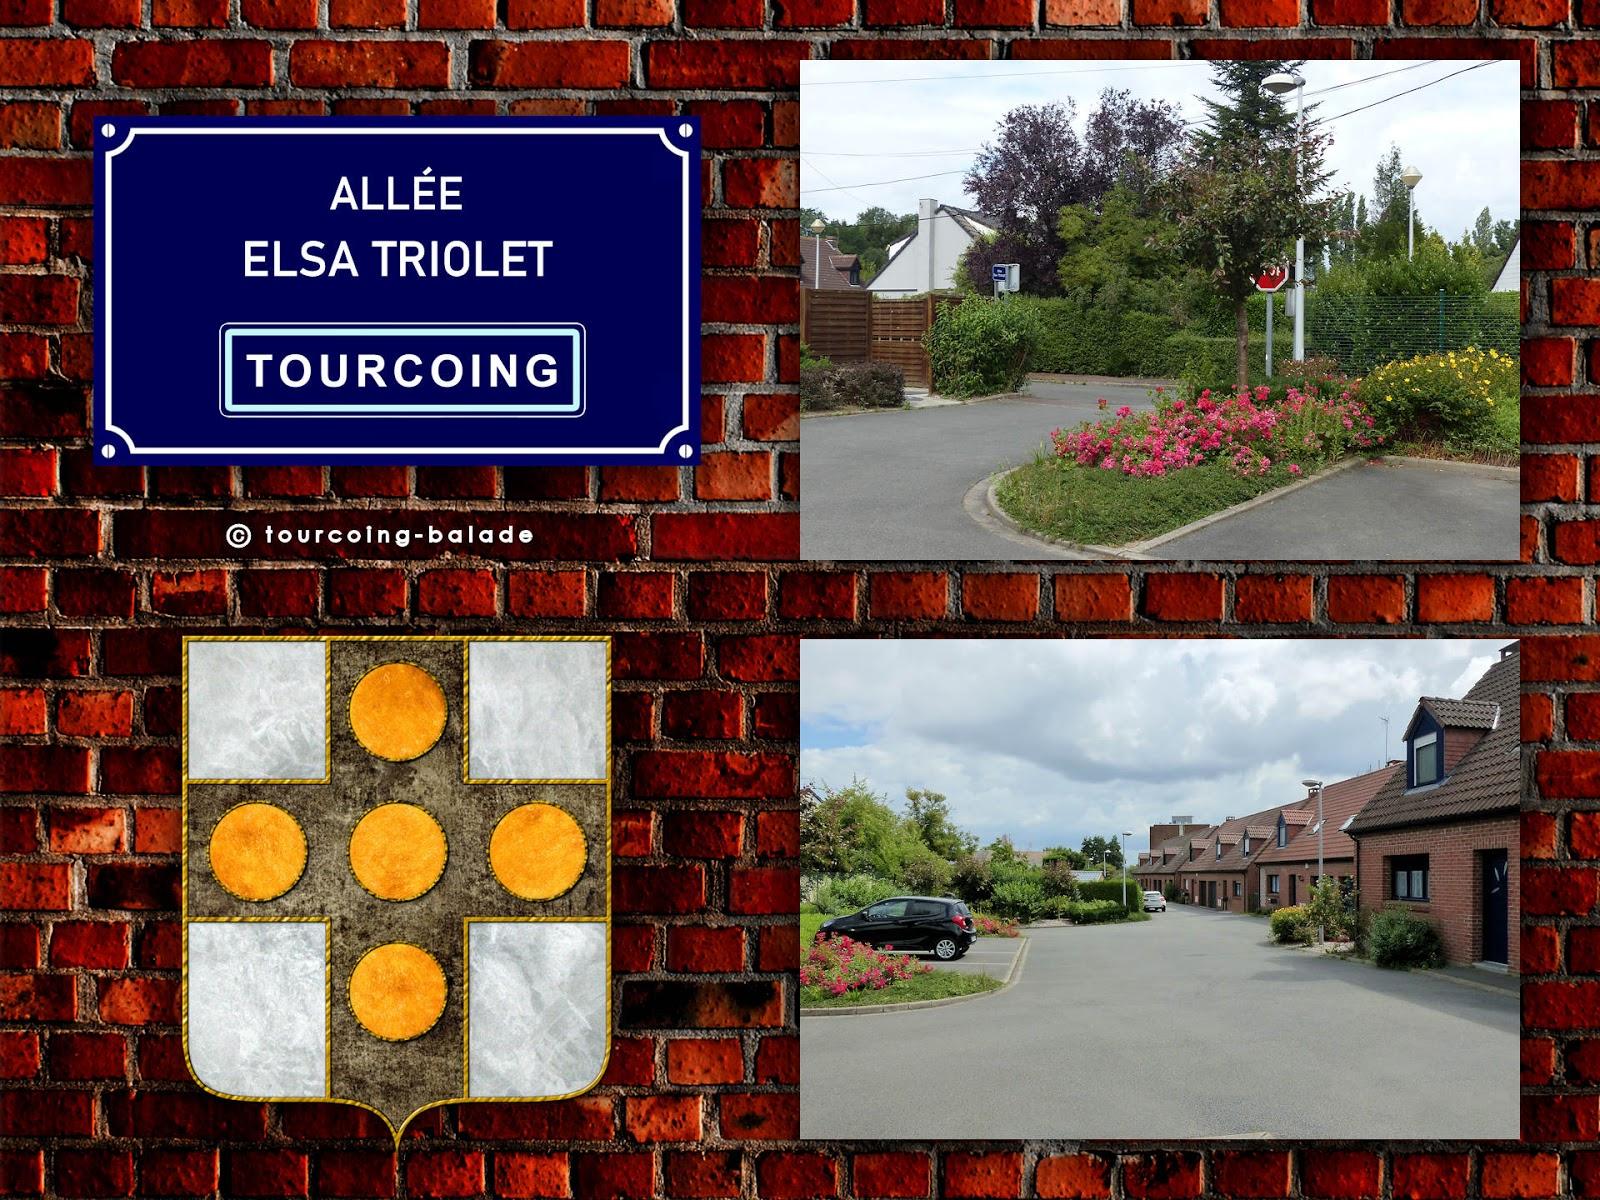 Rues de Tourcoing - Allée Elsa Triolet, 2020